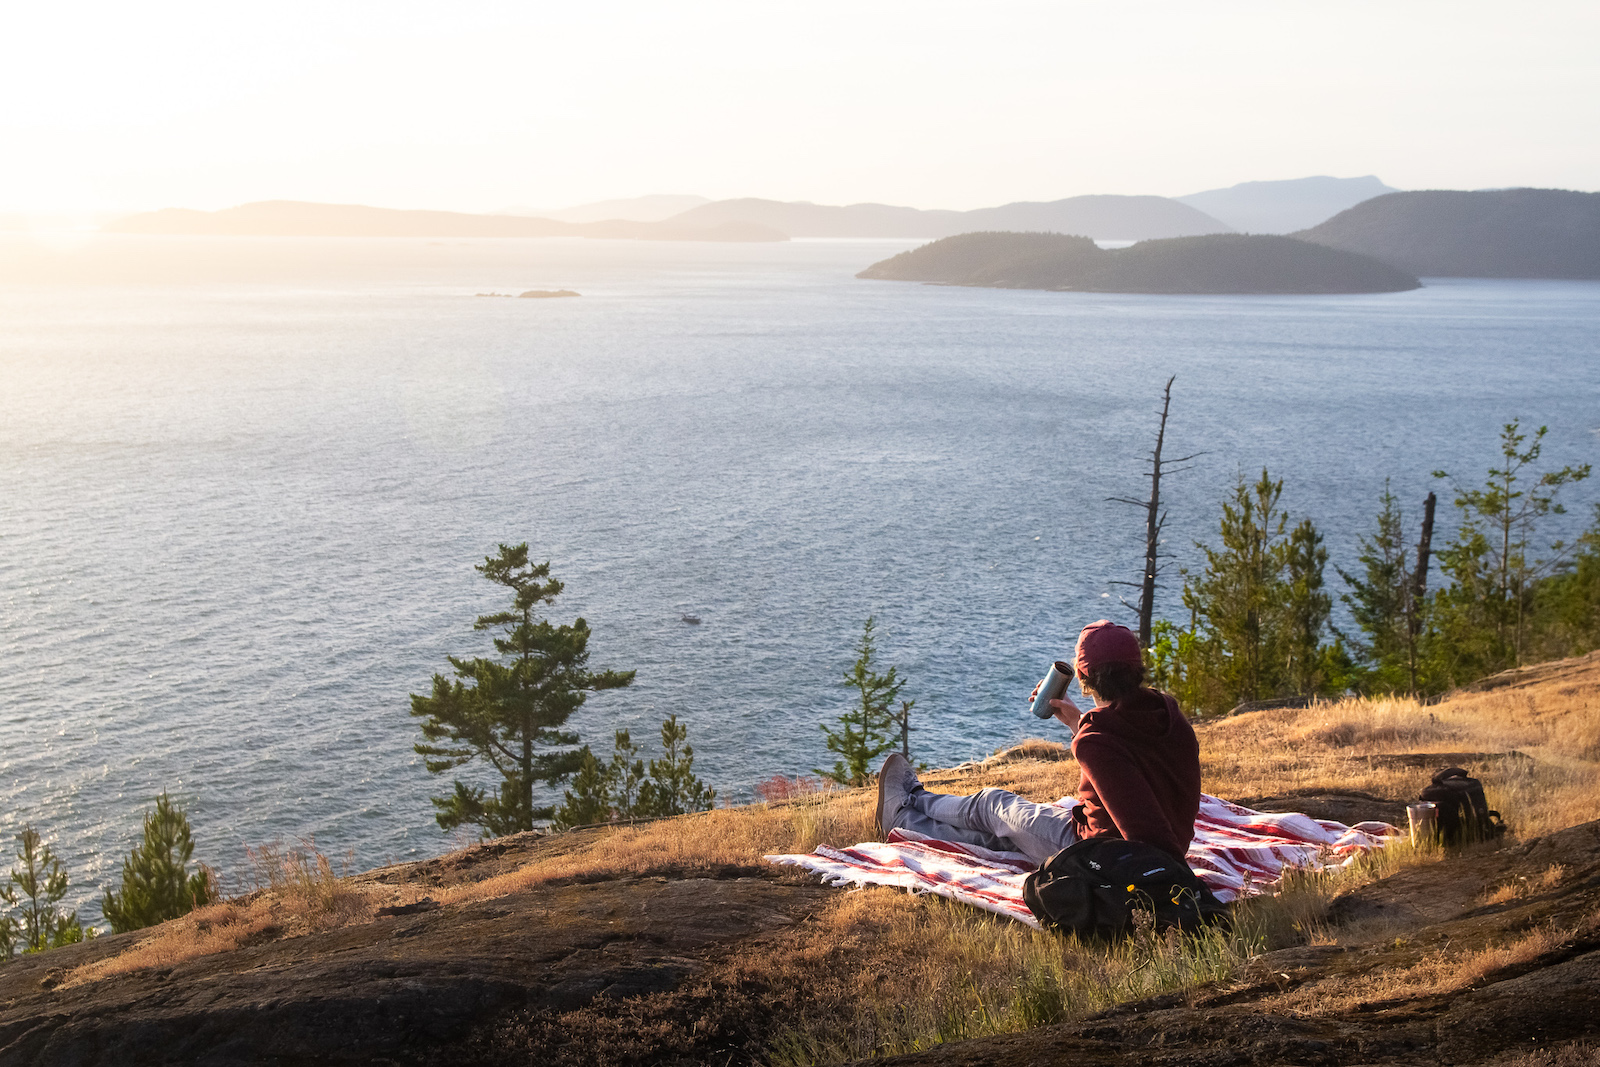 Sunset picnic at Sares Head in Anacortes, Washington.